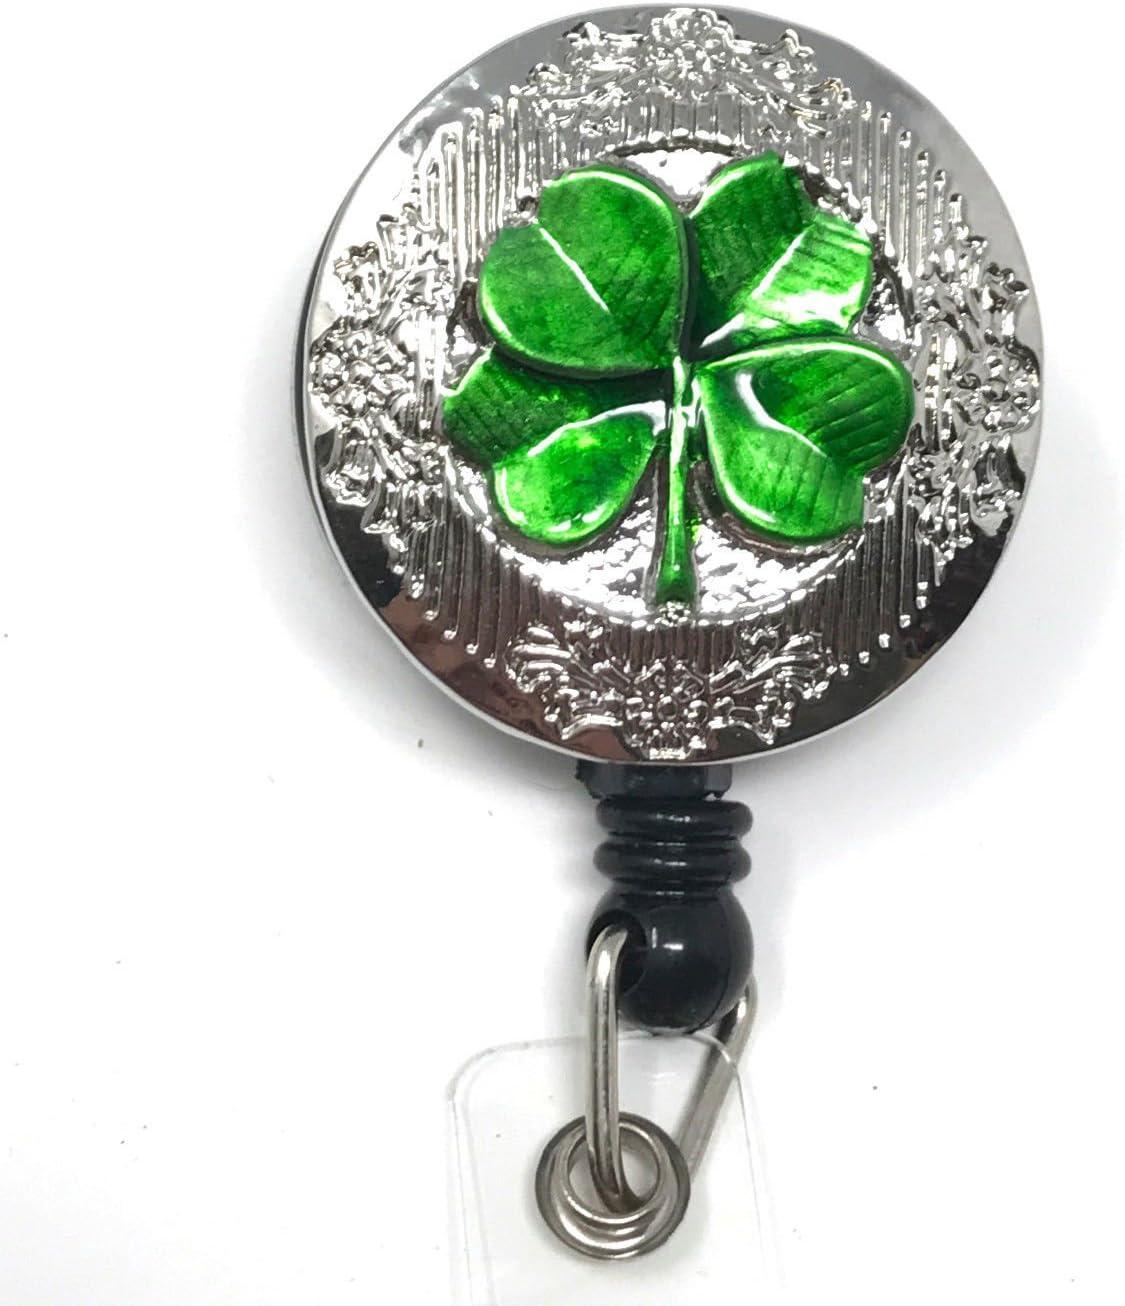 Get Lucky Badge Reel-Shamrock Badge Reel-St Patrick\u2019s Day Badge Reel-St Paddy\u2019s Day Badge Reel-Nurse Badge Reel-Teacher Badge Reel